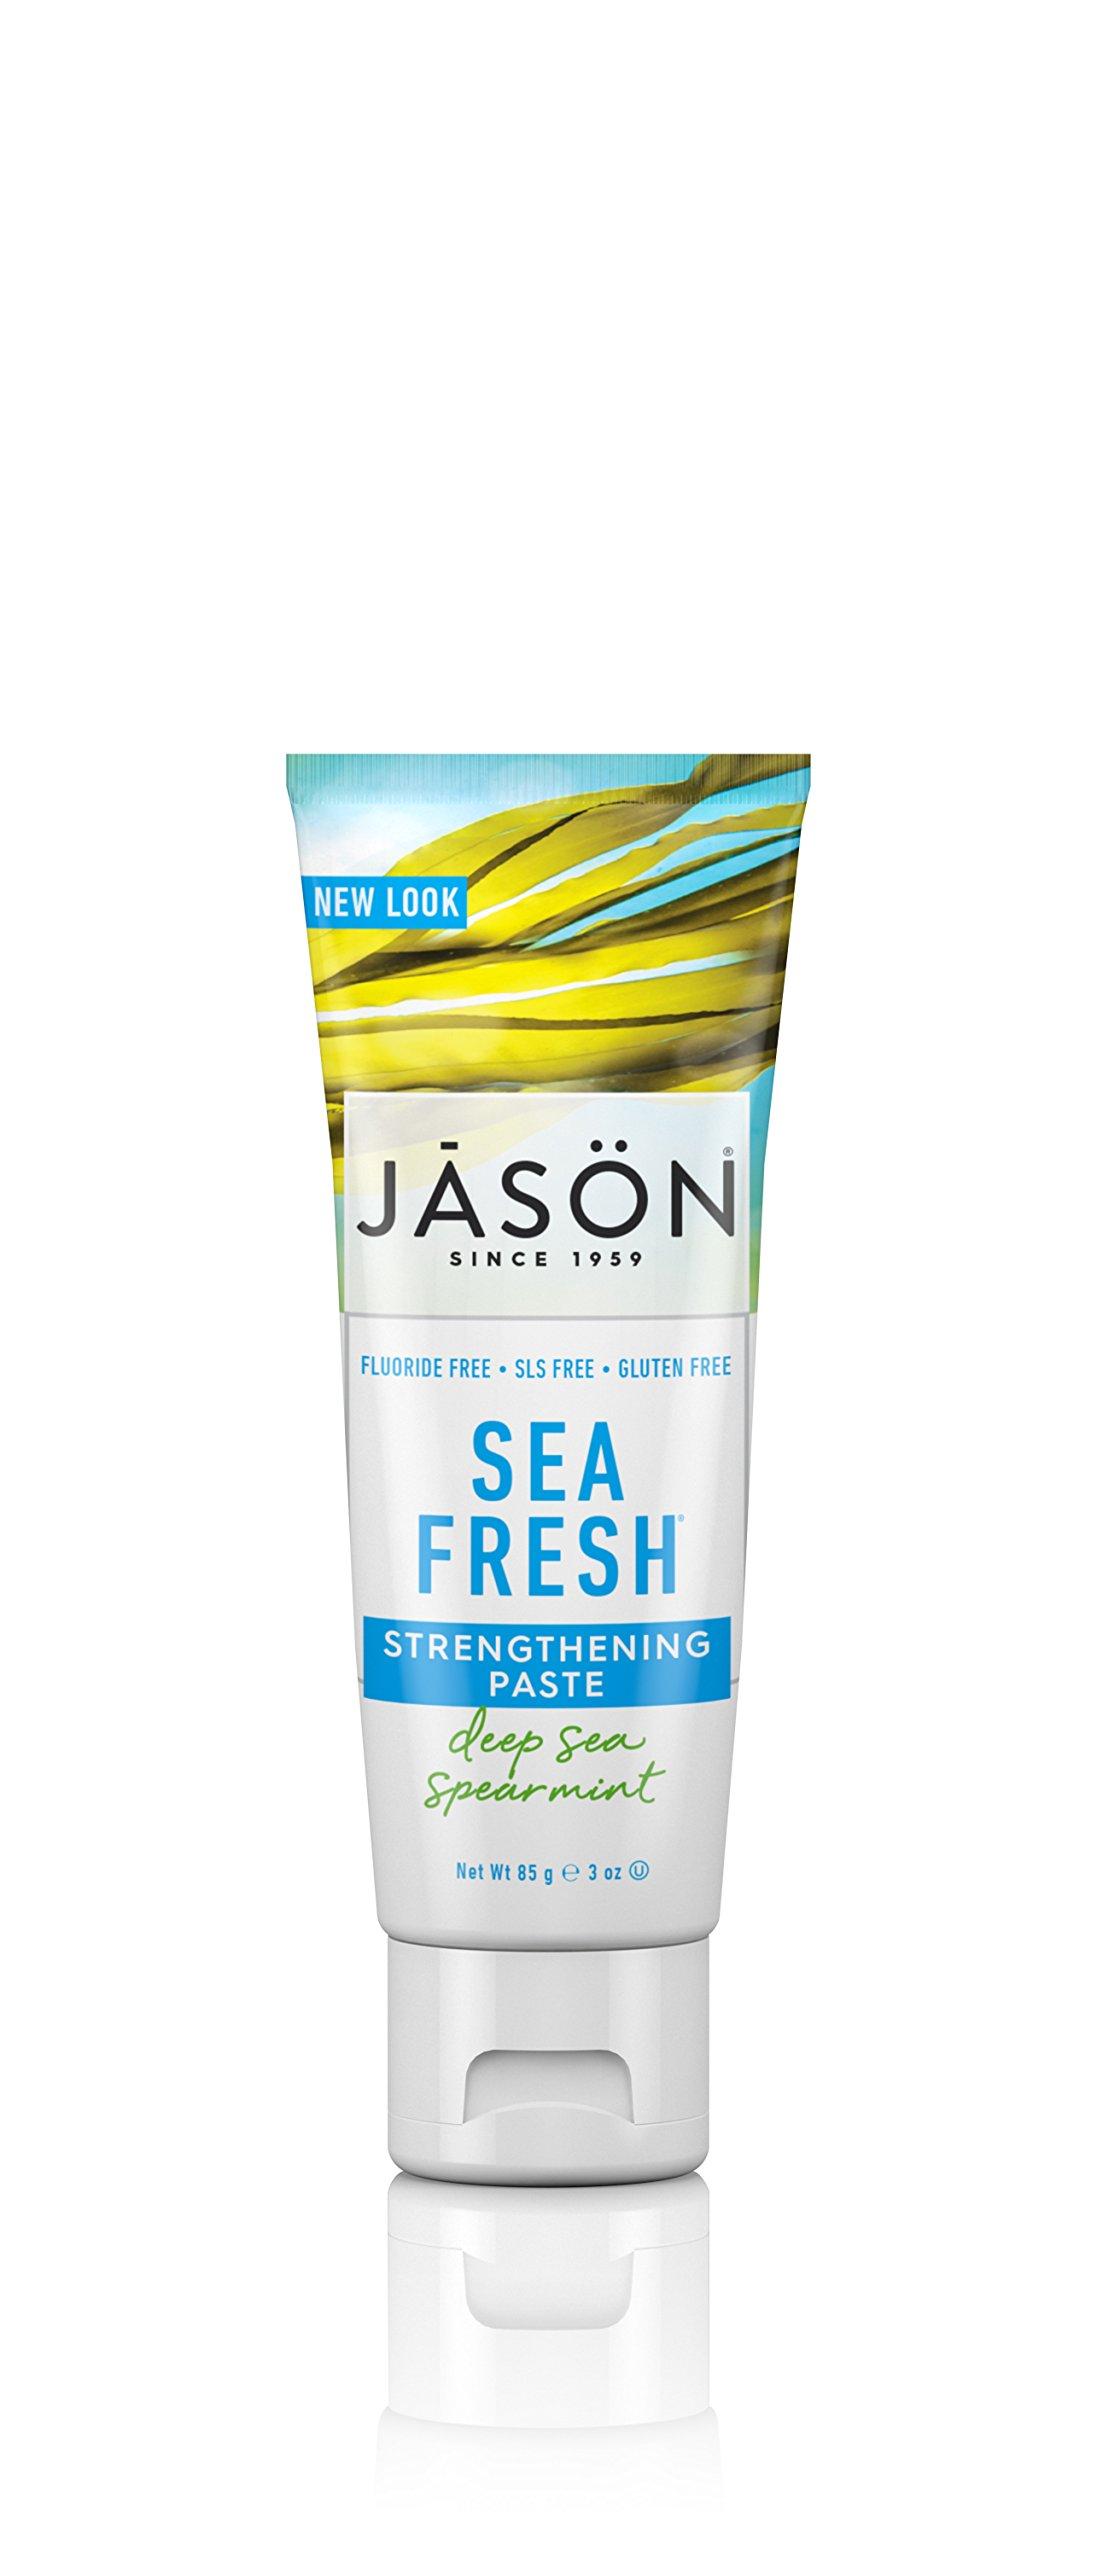 JASON Sea Fresh Strengthening Fluoride-Free Toothpaste $3.24